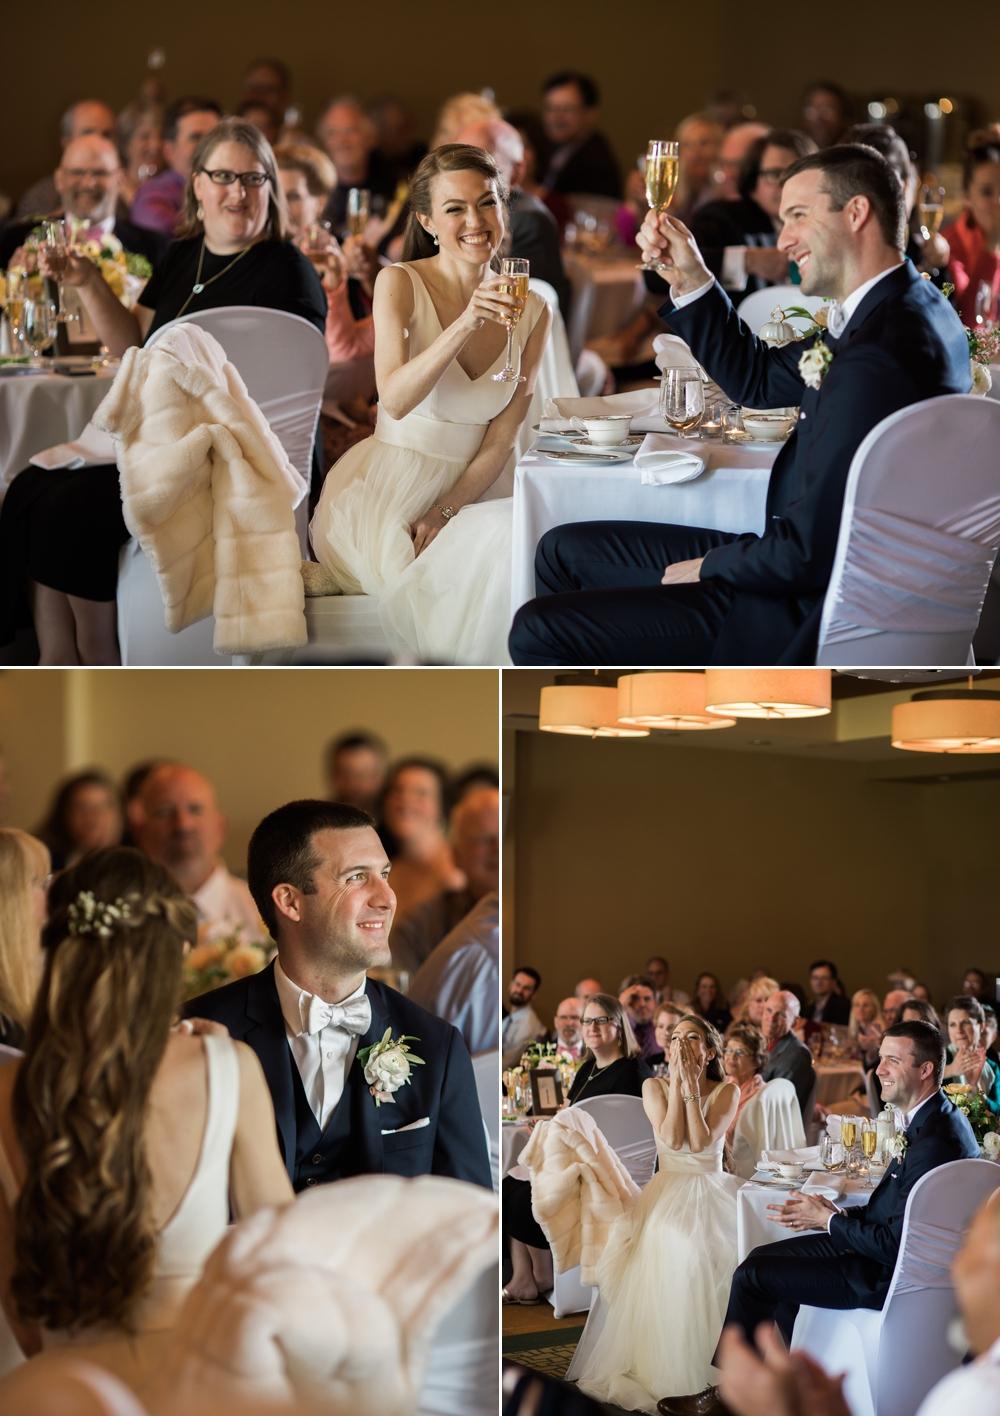 wedding-toasts-and-speeches